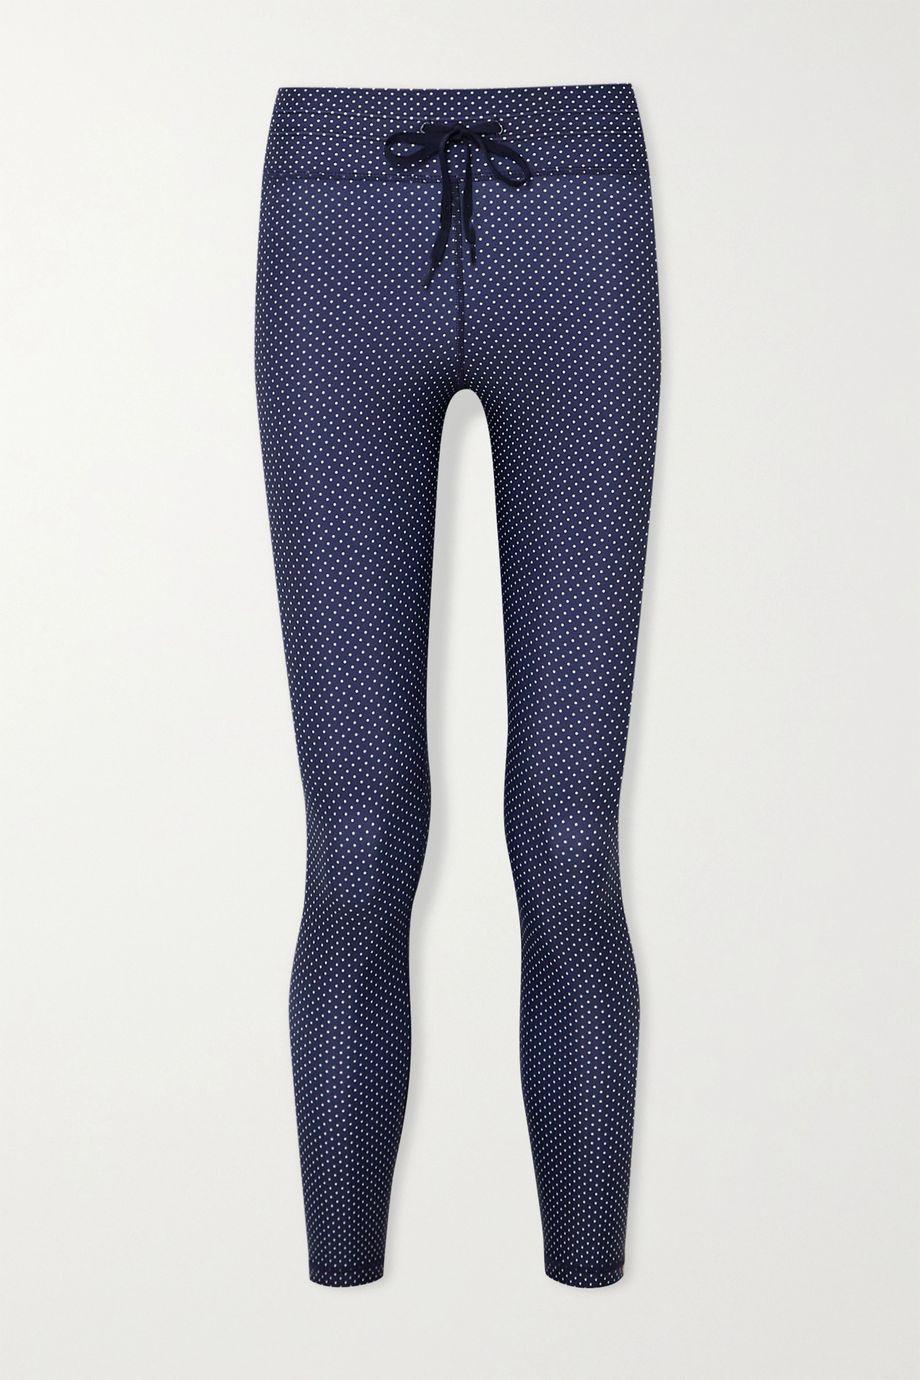 The Upside Polka-dot stretch leggings